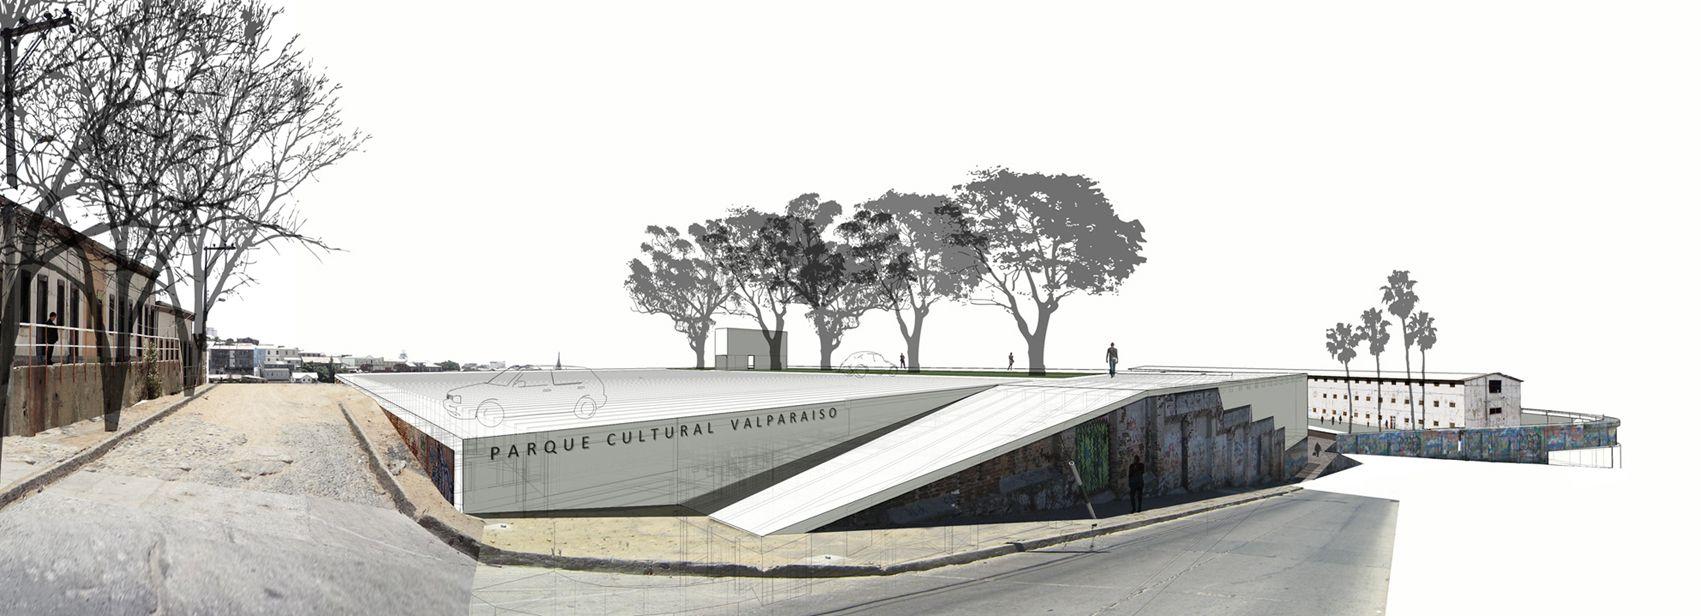 Concurso Parque Cultural Valparaíso: Proyectos seleccionados